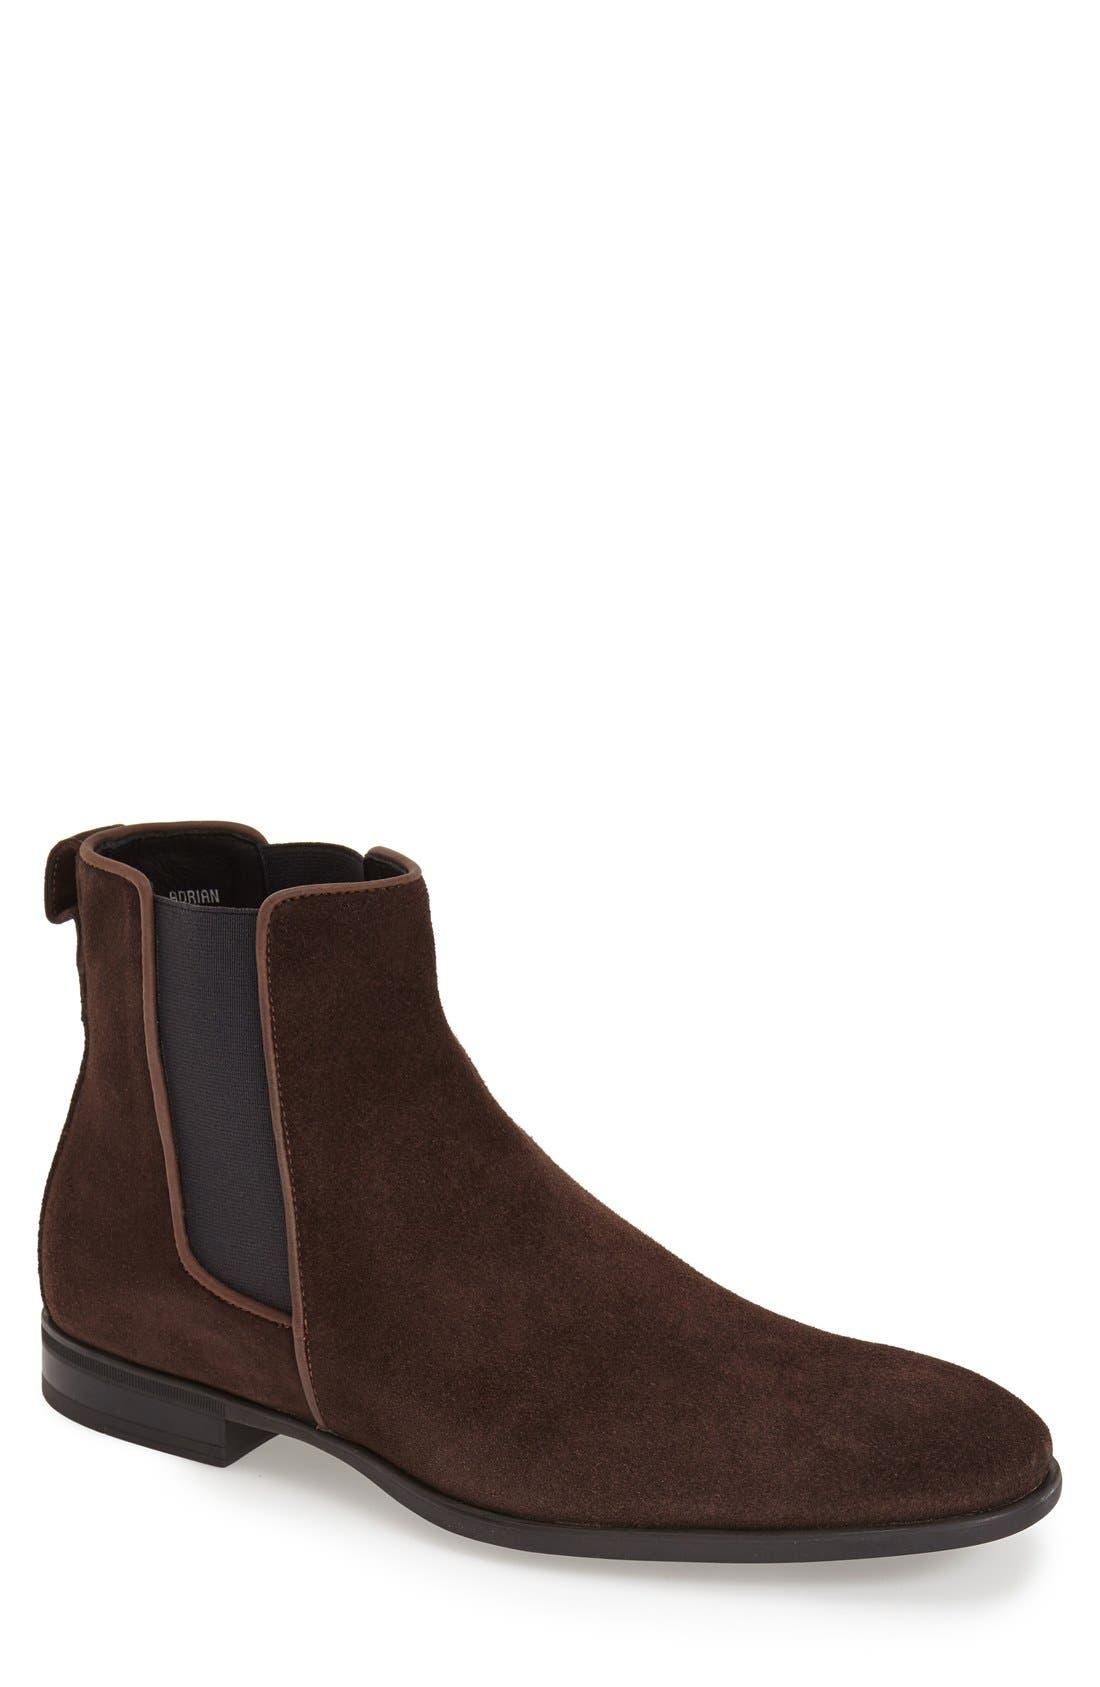 'Adrian' Weatherproof Chelsea Boot,                         Main,                         color, Dark Brown Suede